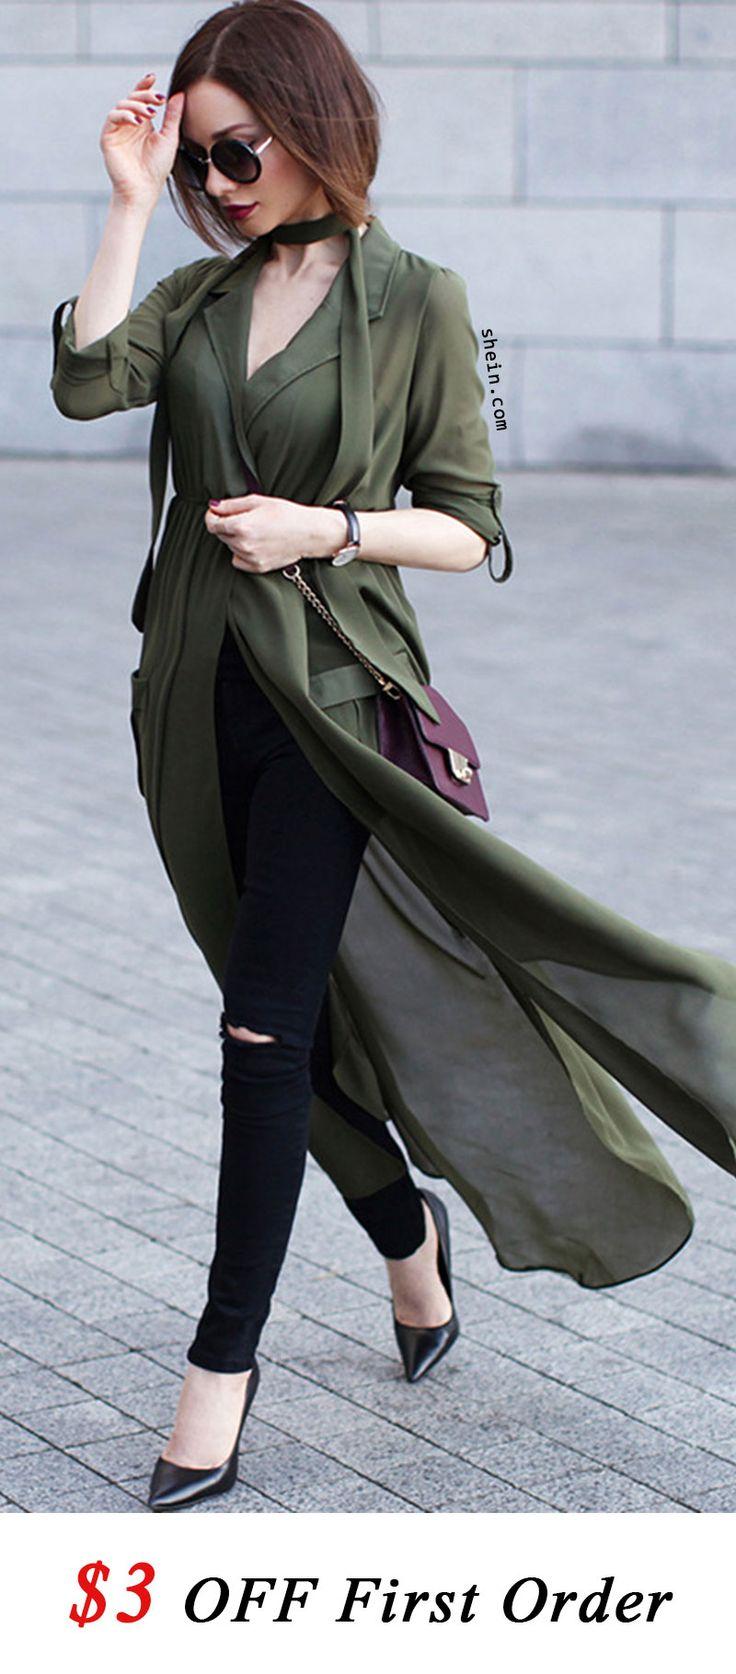 Green Deep V Neck Self-Tie Pockets Chiffon Blouse